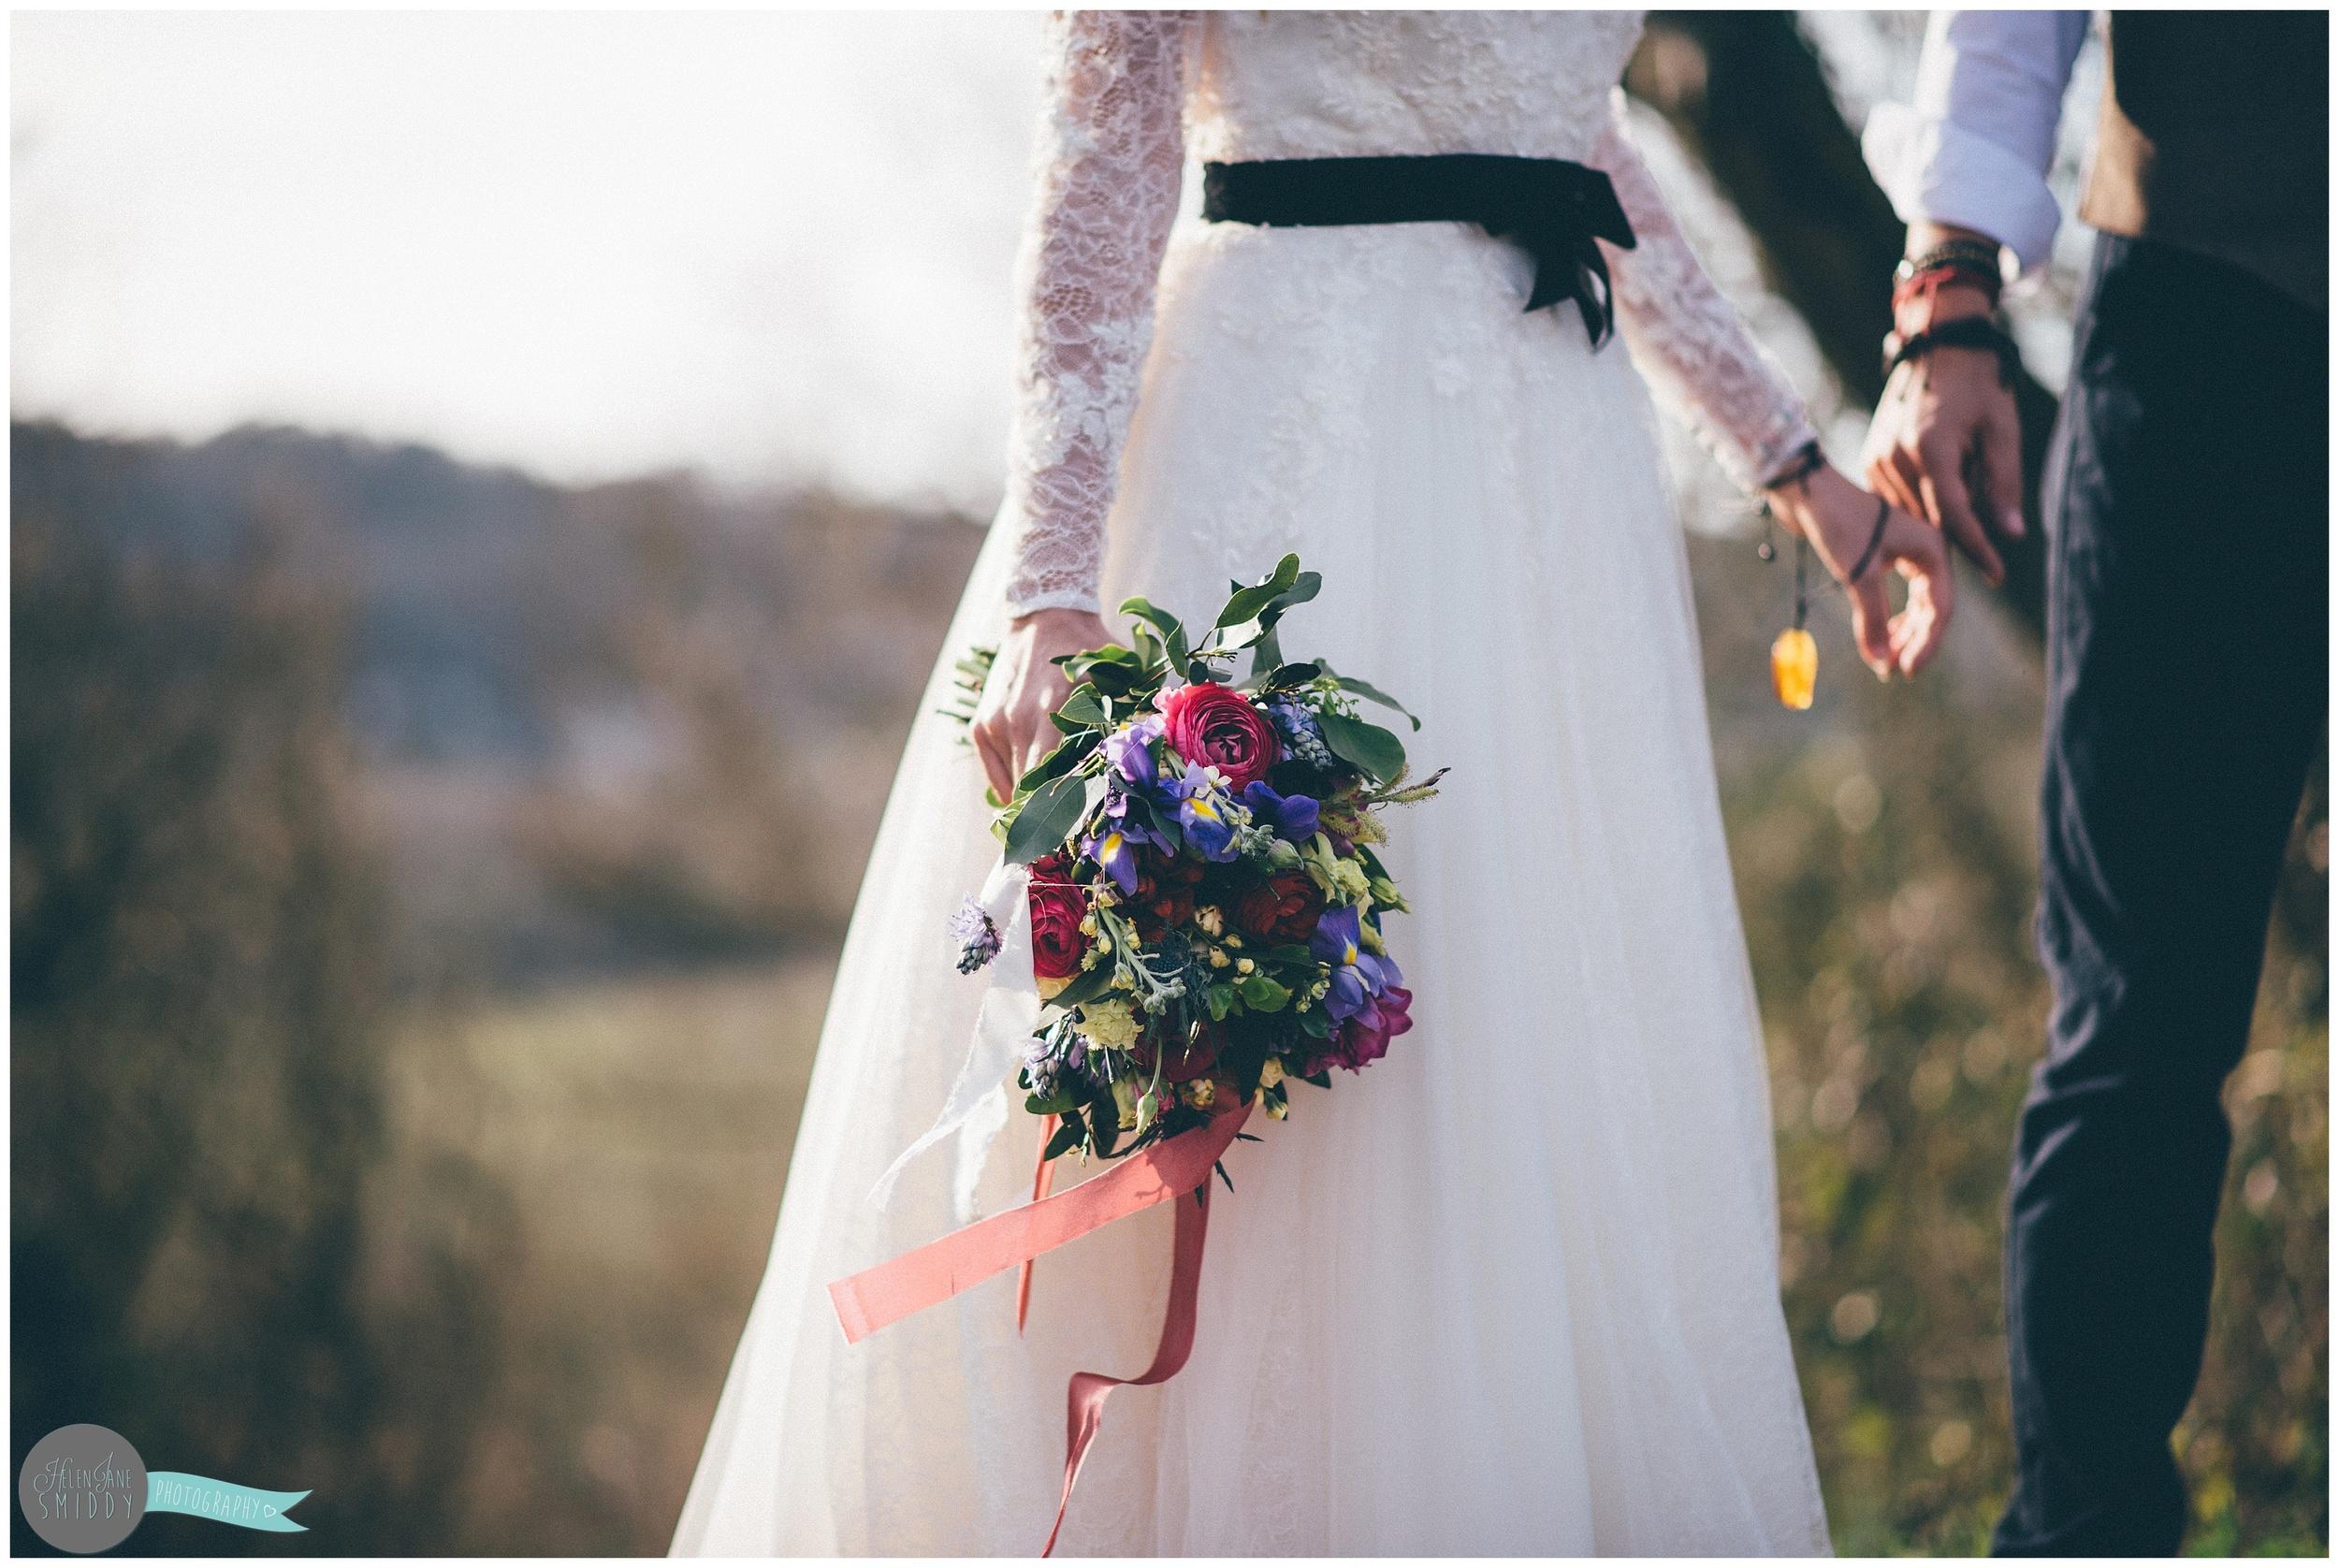 secret-wedding-ceremony-photography -snap-festival-boho-chic-vintage-wales-fforest-shabby-chic